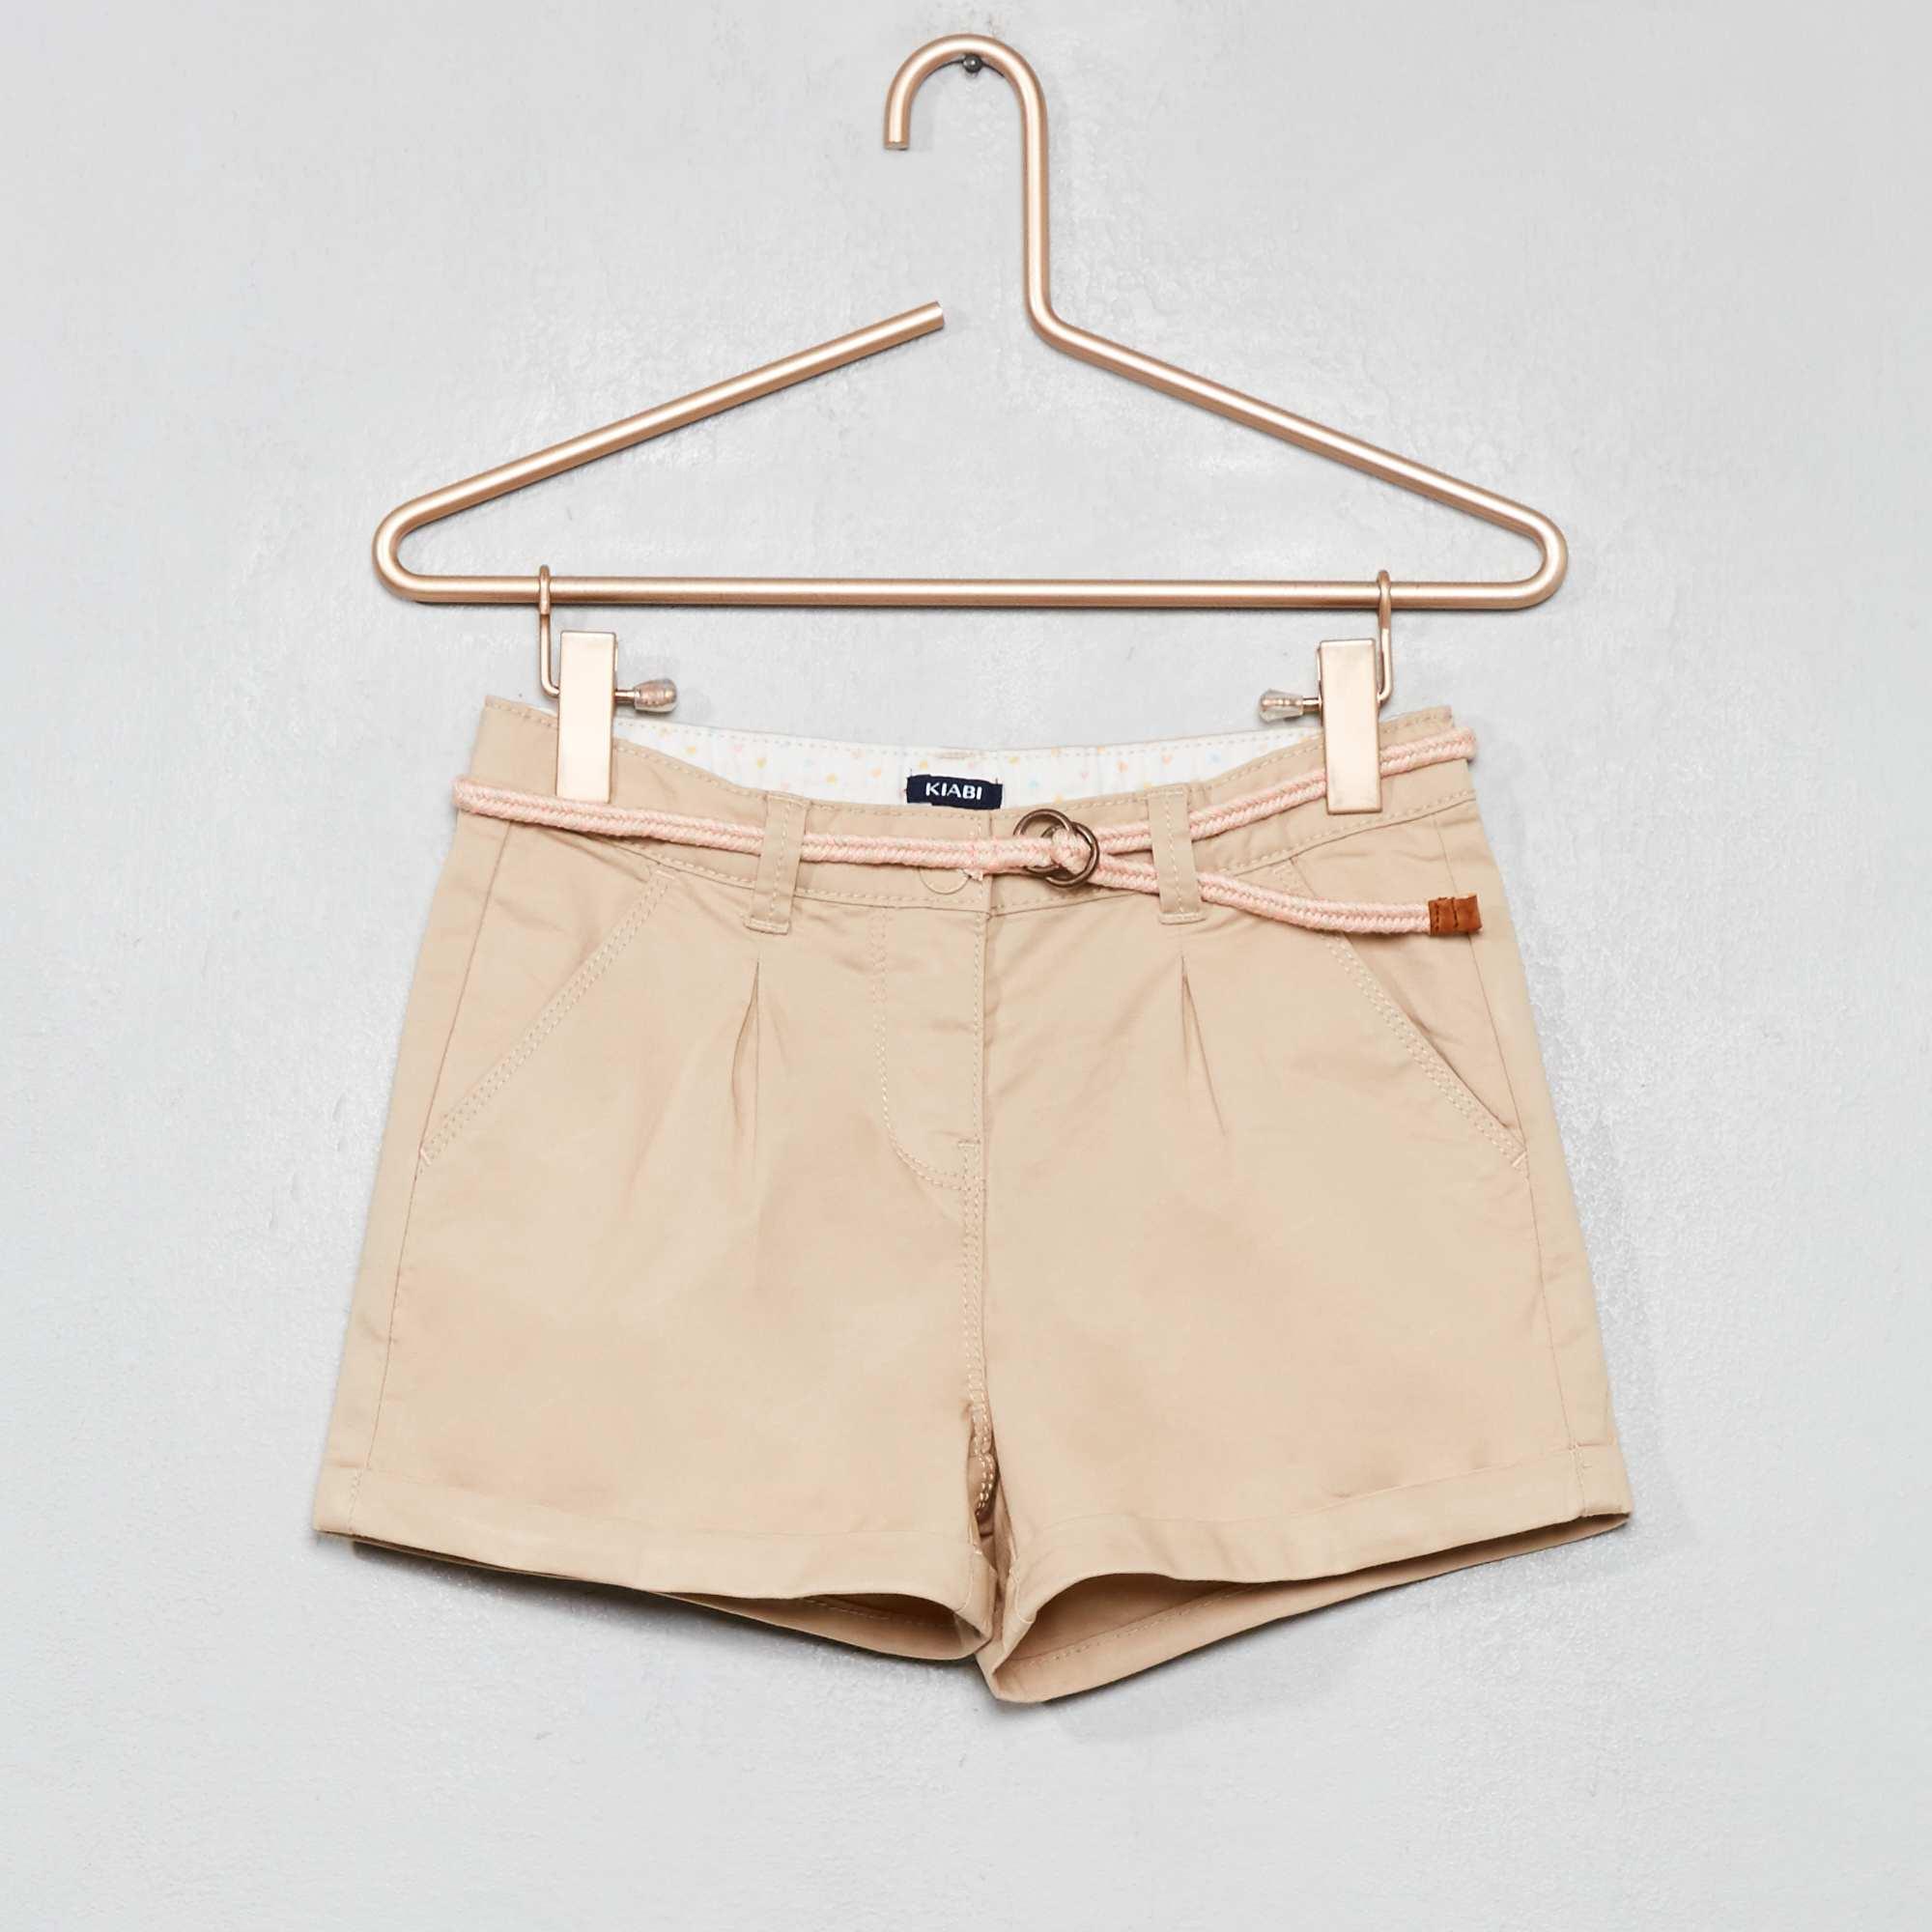 532a8a360e9 Short uni + ceinture tressée Fille - beige - Kiabi - 10